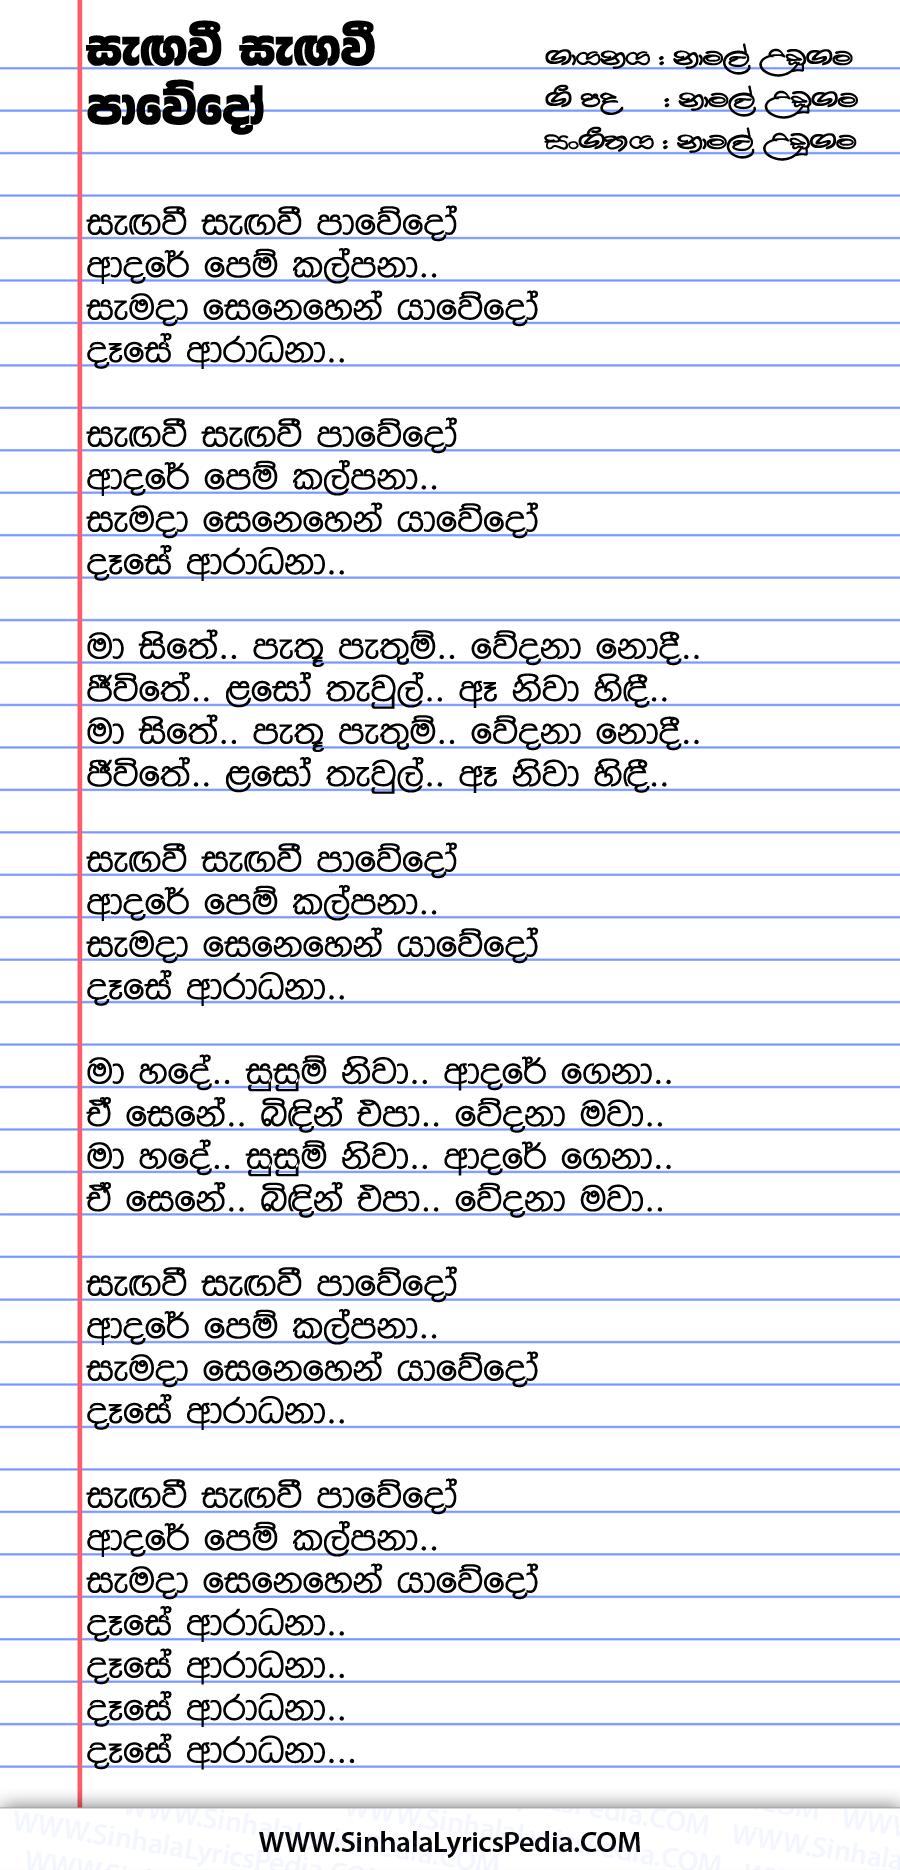 Sangavi Sangavi Pawedo Song Lyrics